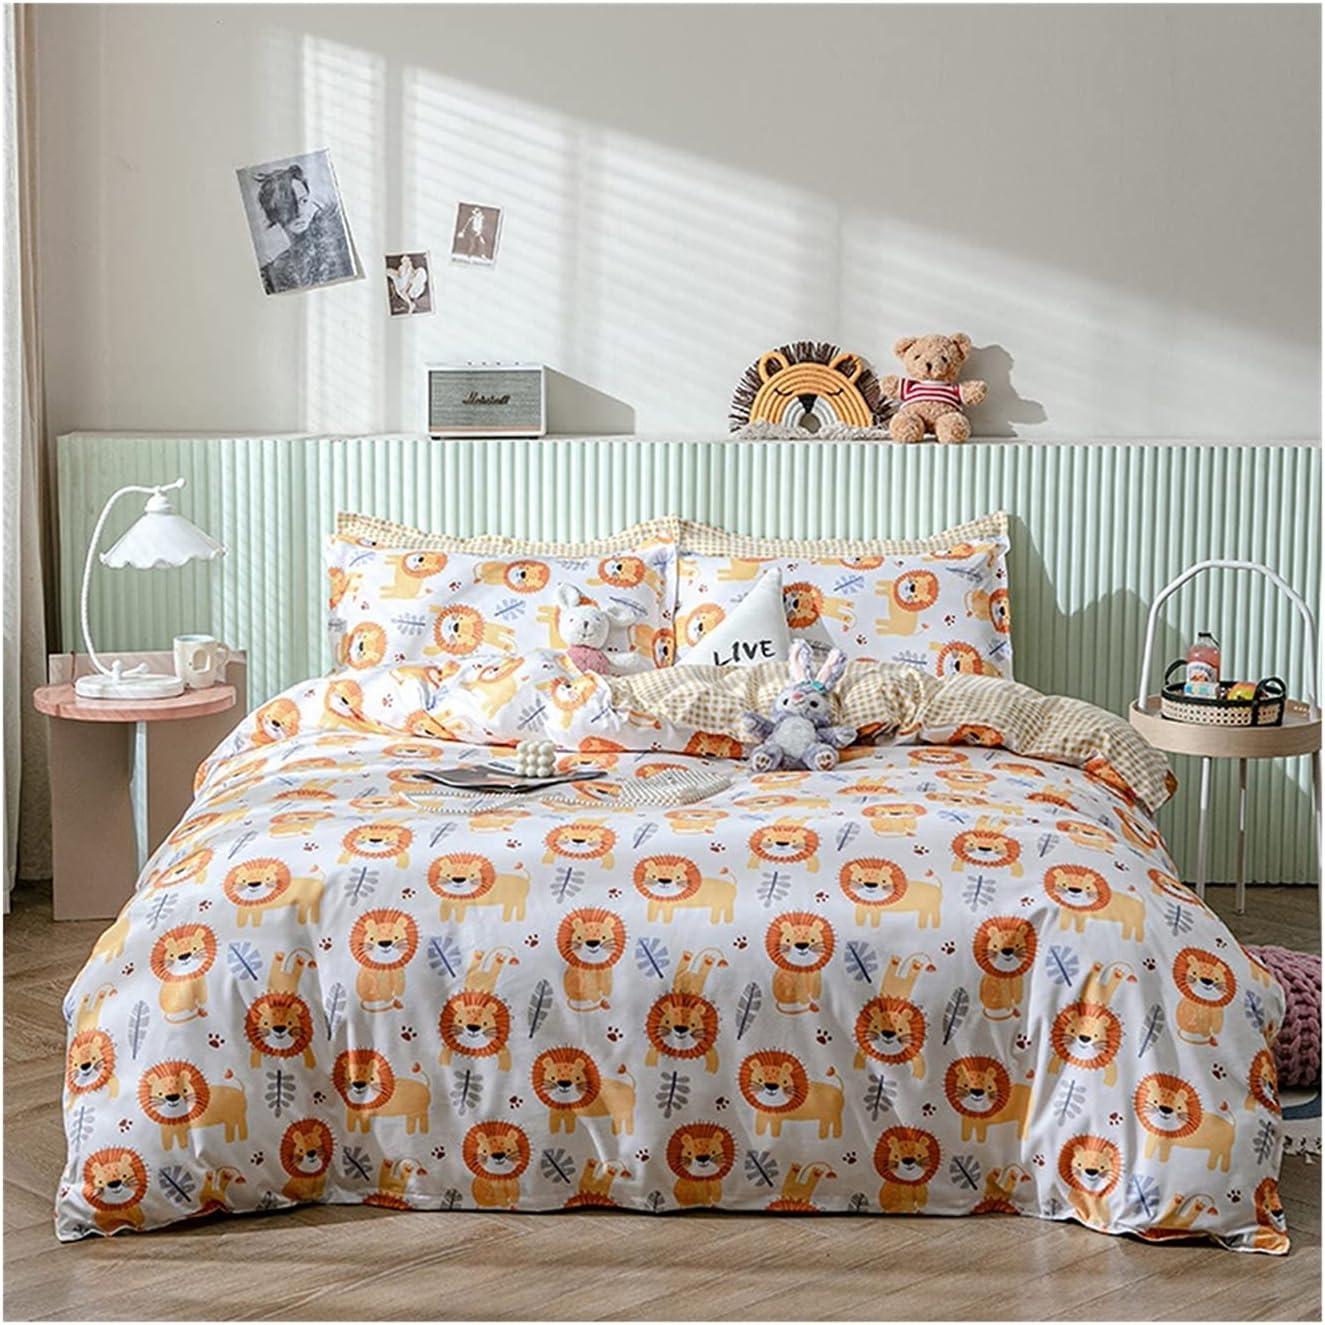 LSDJ QMDSH Home Textile Girl Bedding Peach Set Baltimore Mall Cover Duvet Regular discount Pink